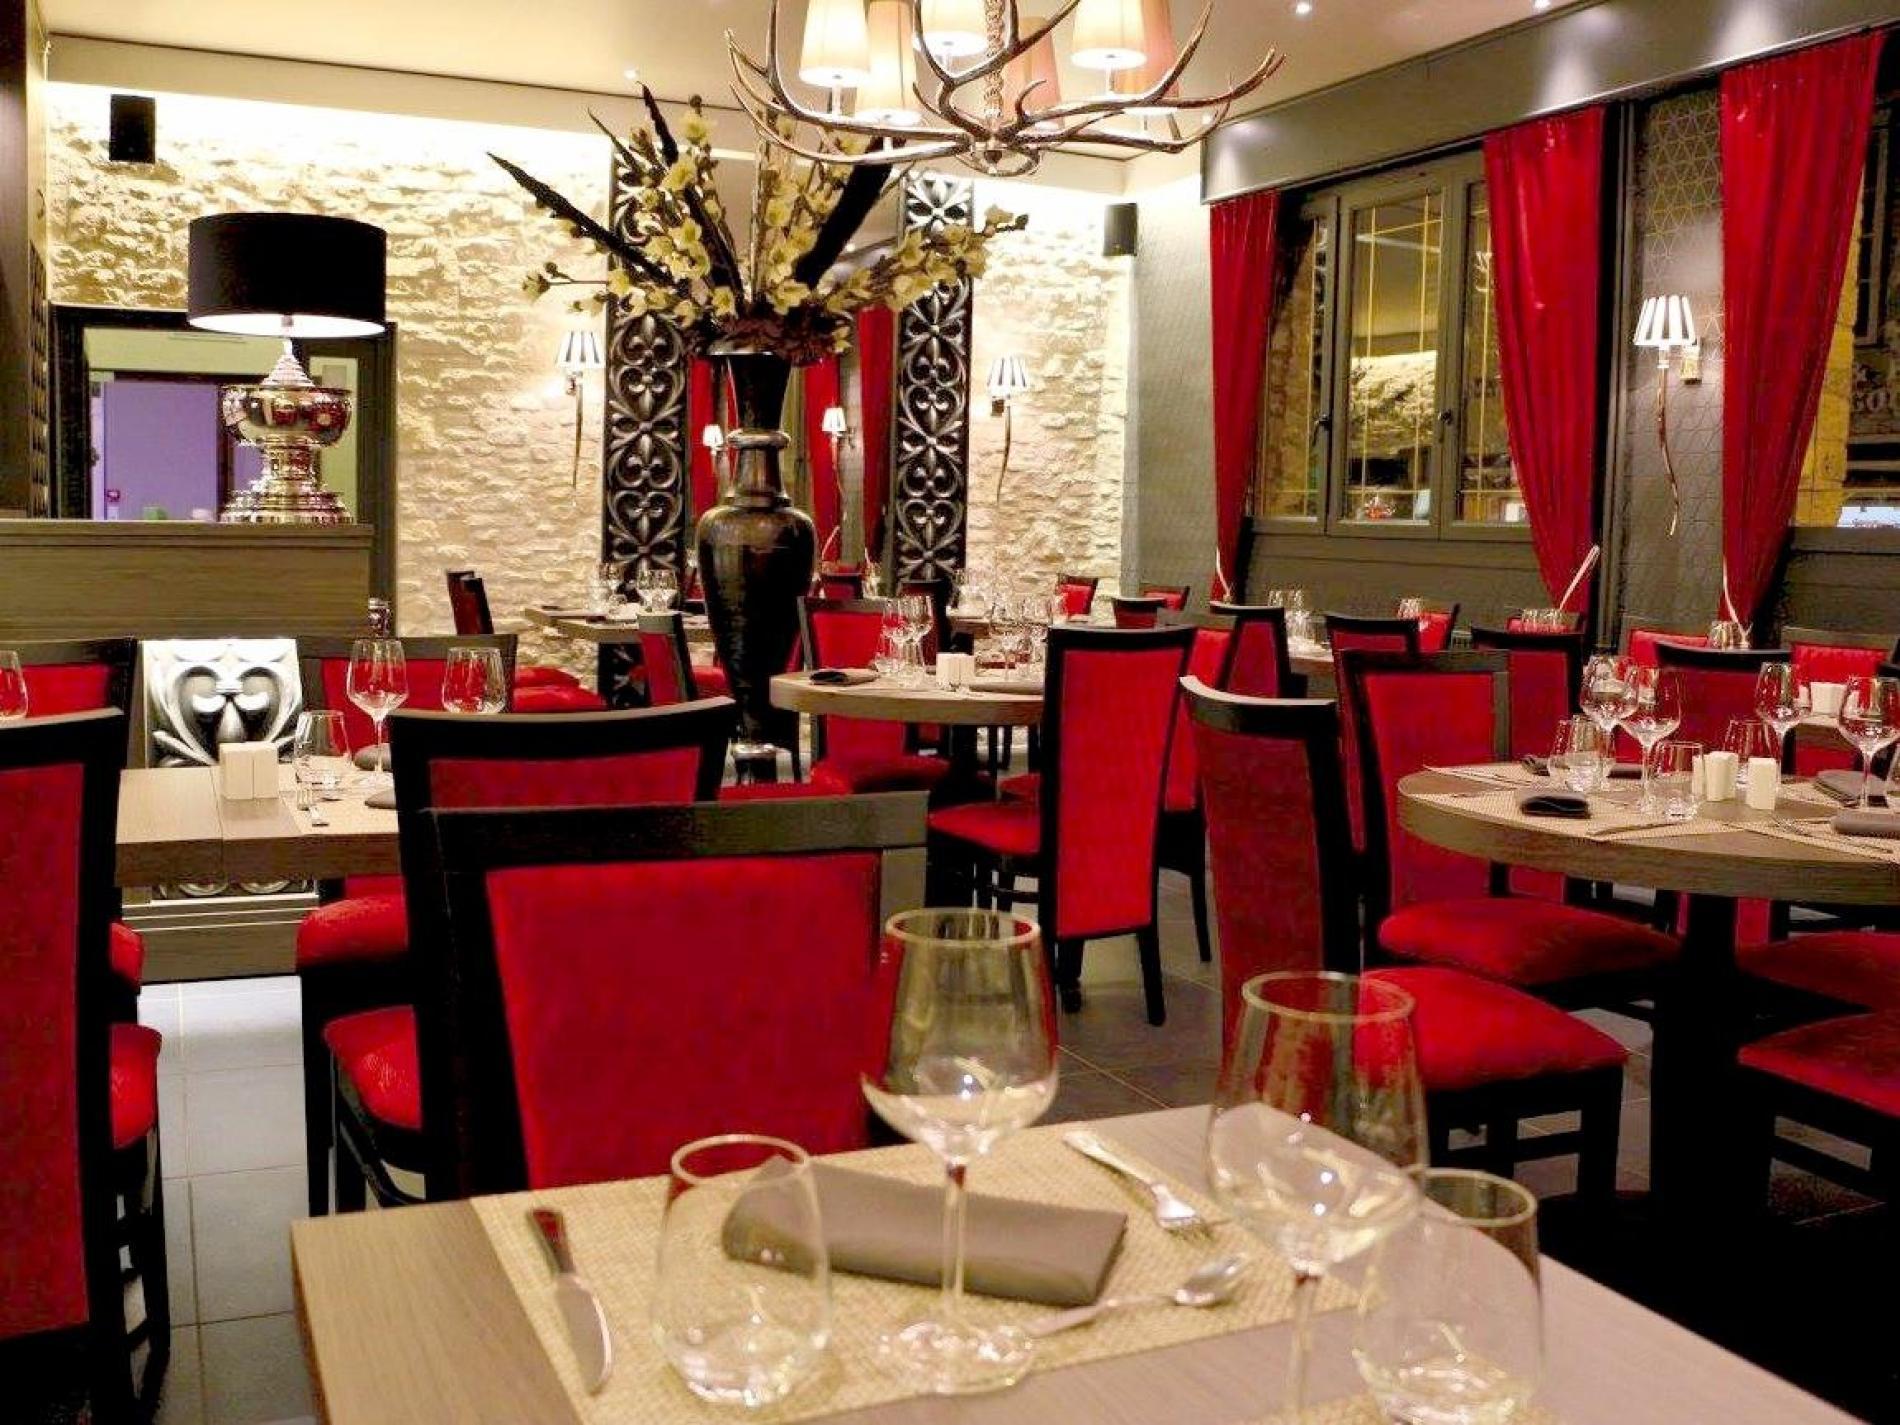 Restaurant Aunay S/Audon